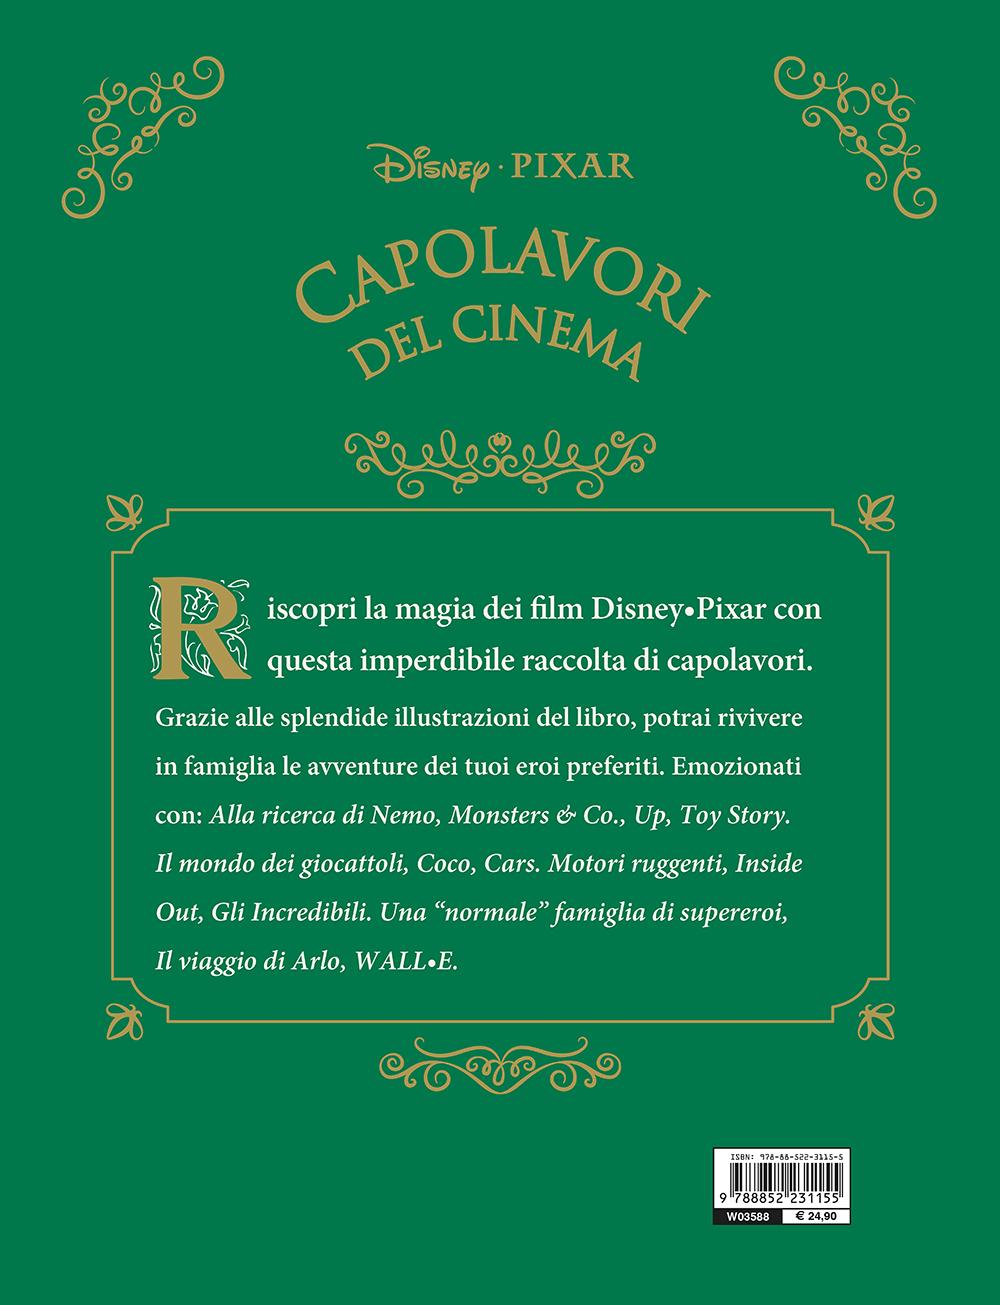 Fiabe Collection - Capolavori del Cinema Disney/Pixar